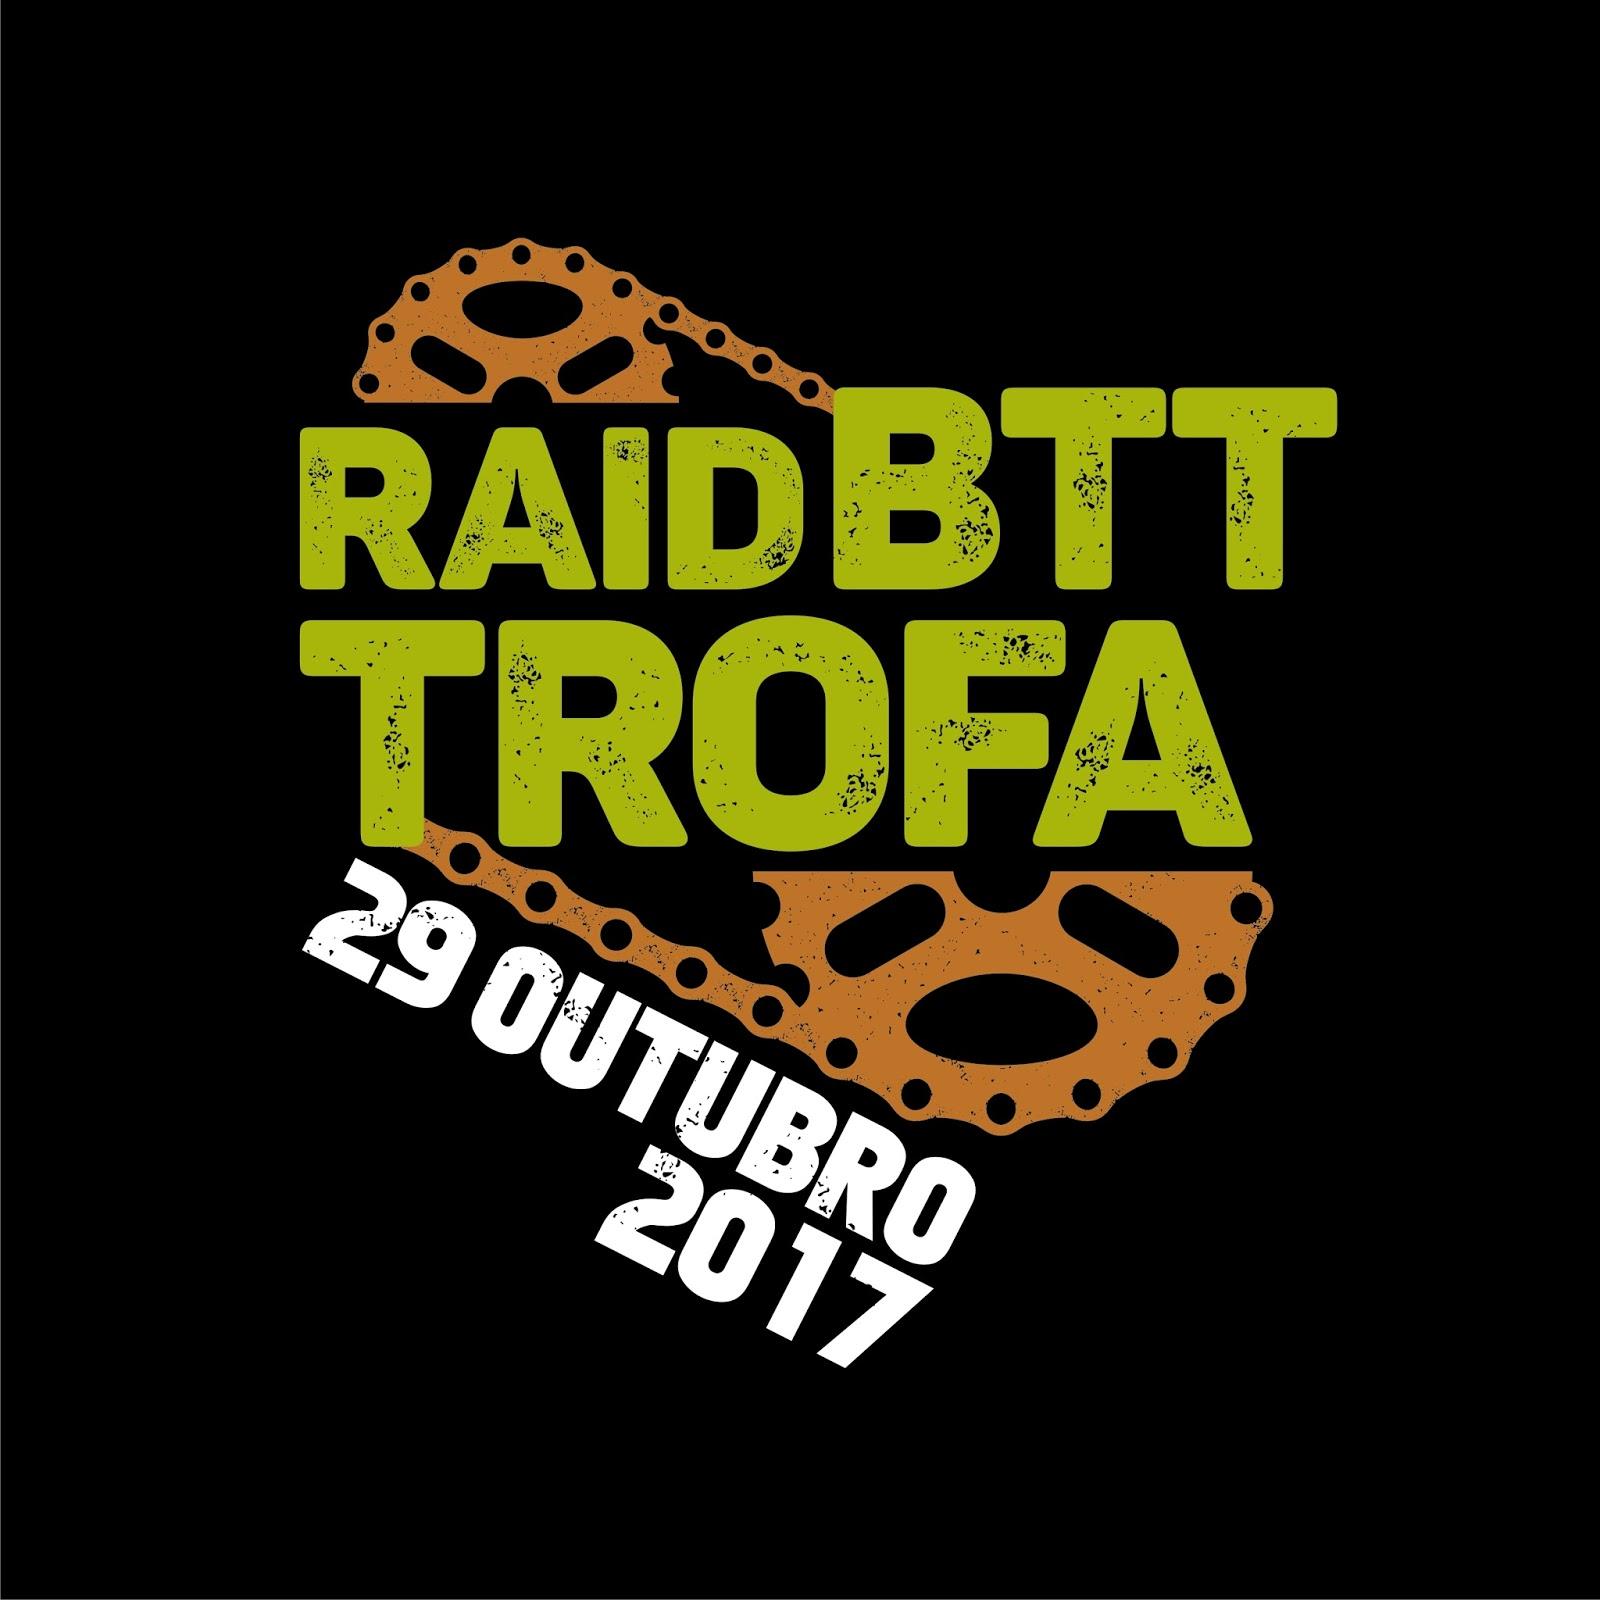 RACEBOOK RAID BTT TROFA 2017